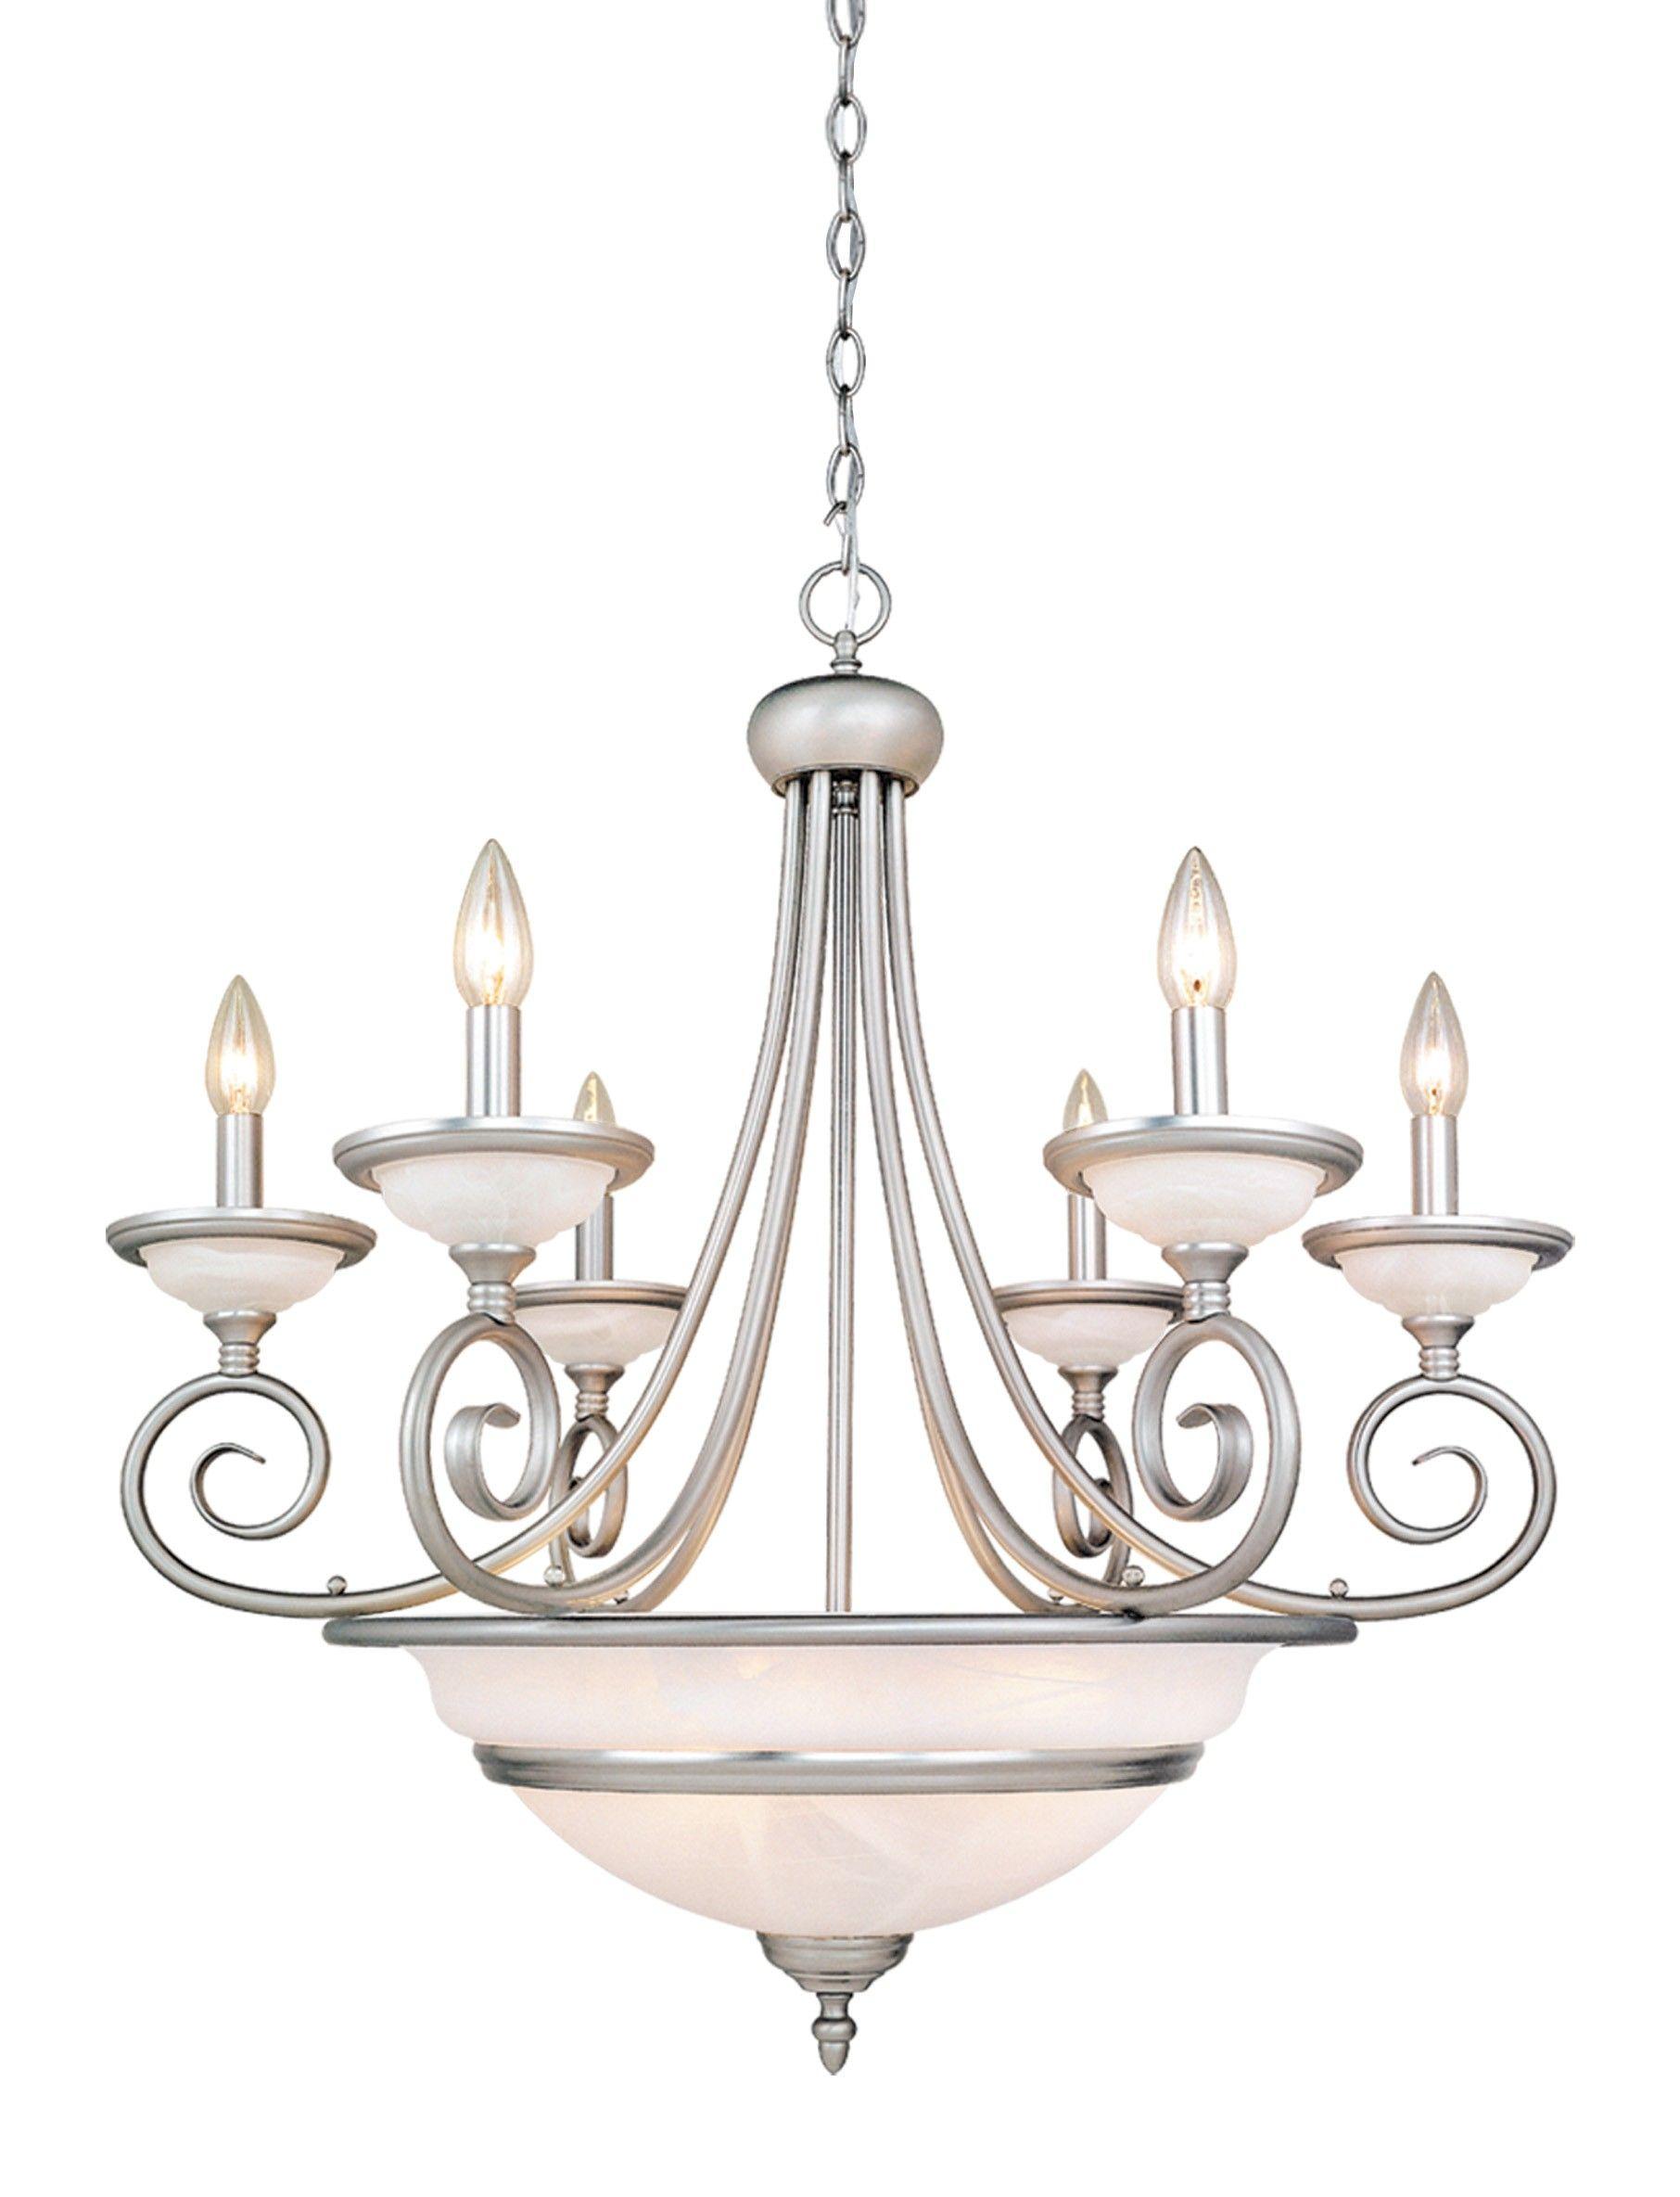 Da Vinci 11 Light Chandelier In Brushed Nickel